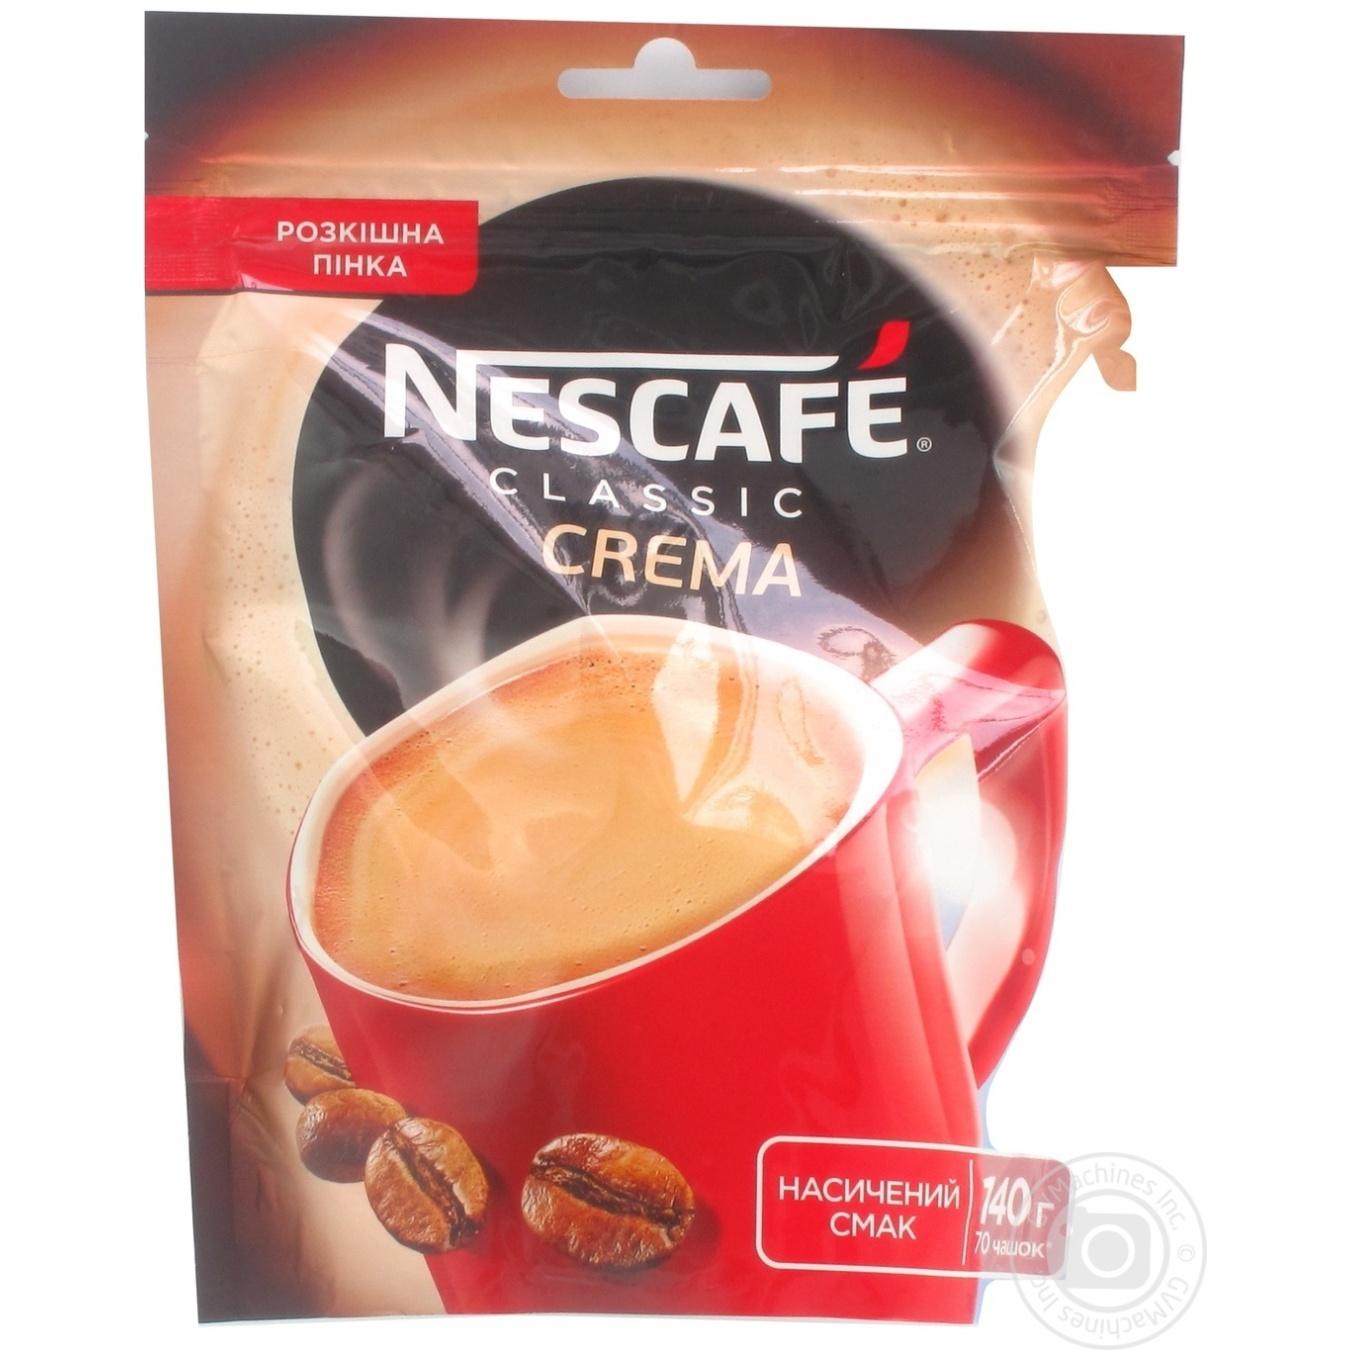 Natural instant coffee Nescafe Classic Crema 140g Ukraine → Drinks, 18+ → Coffee → Instant ...